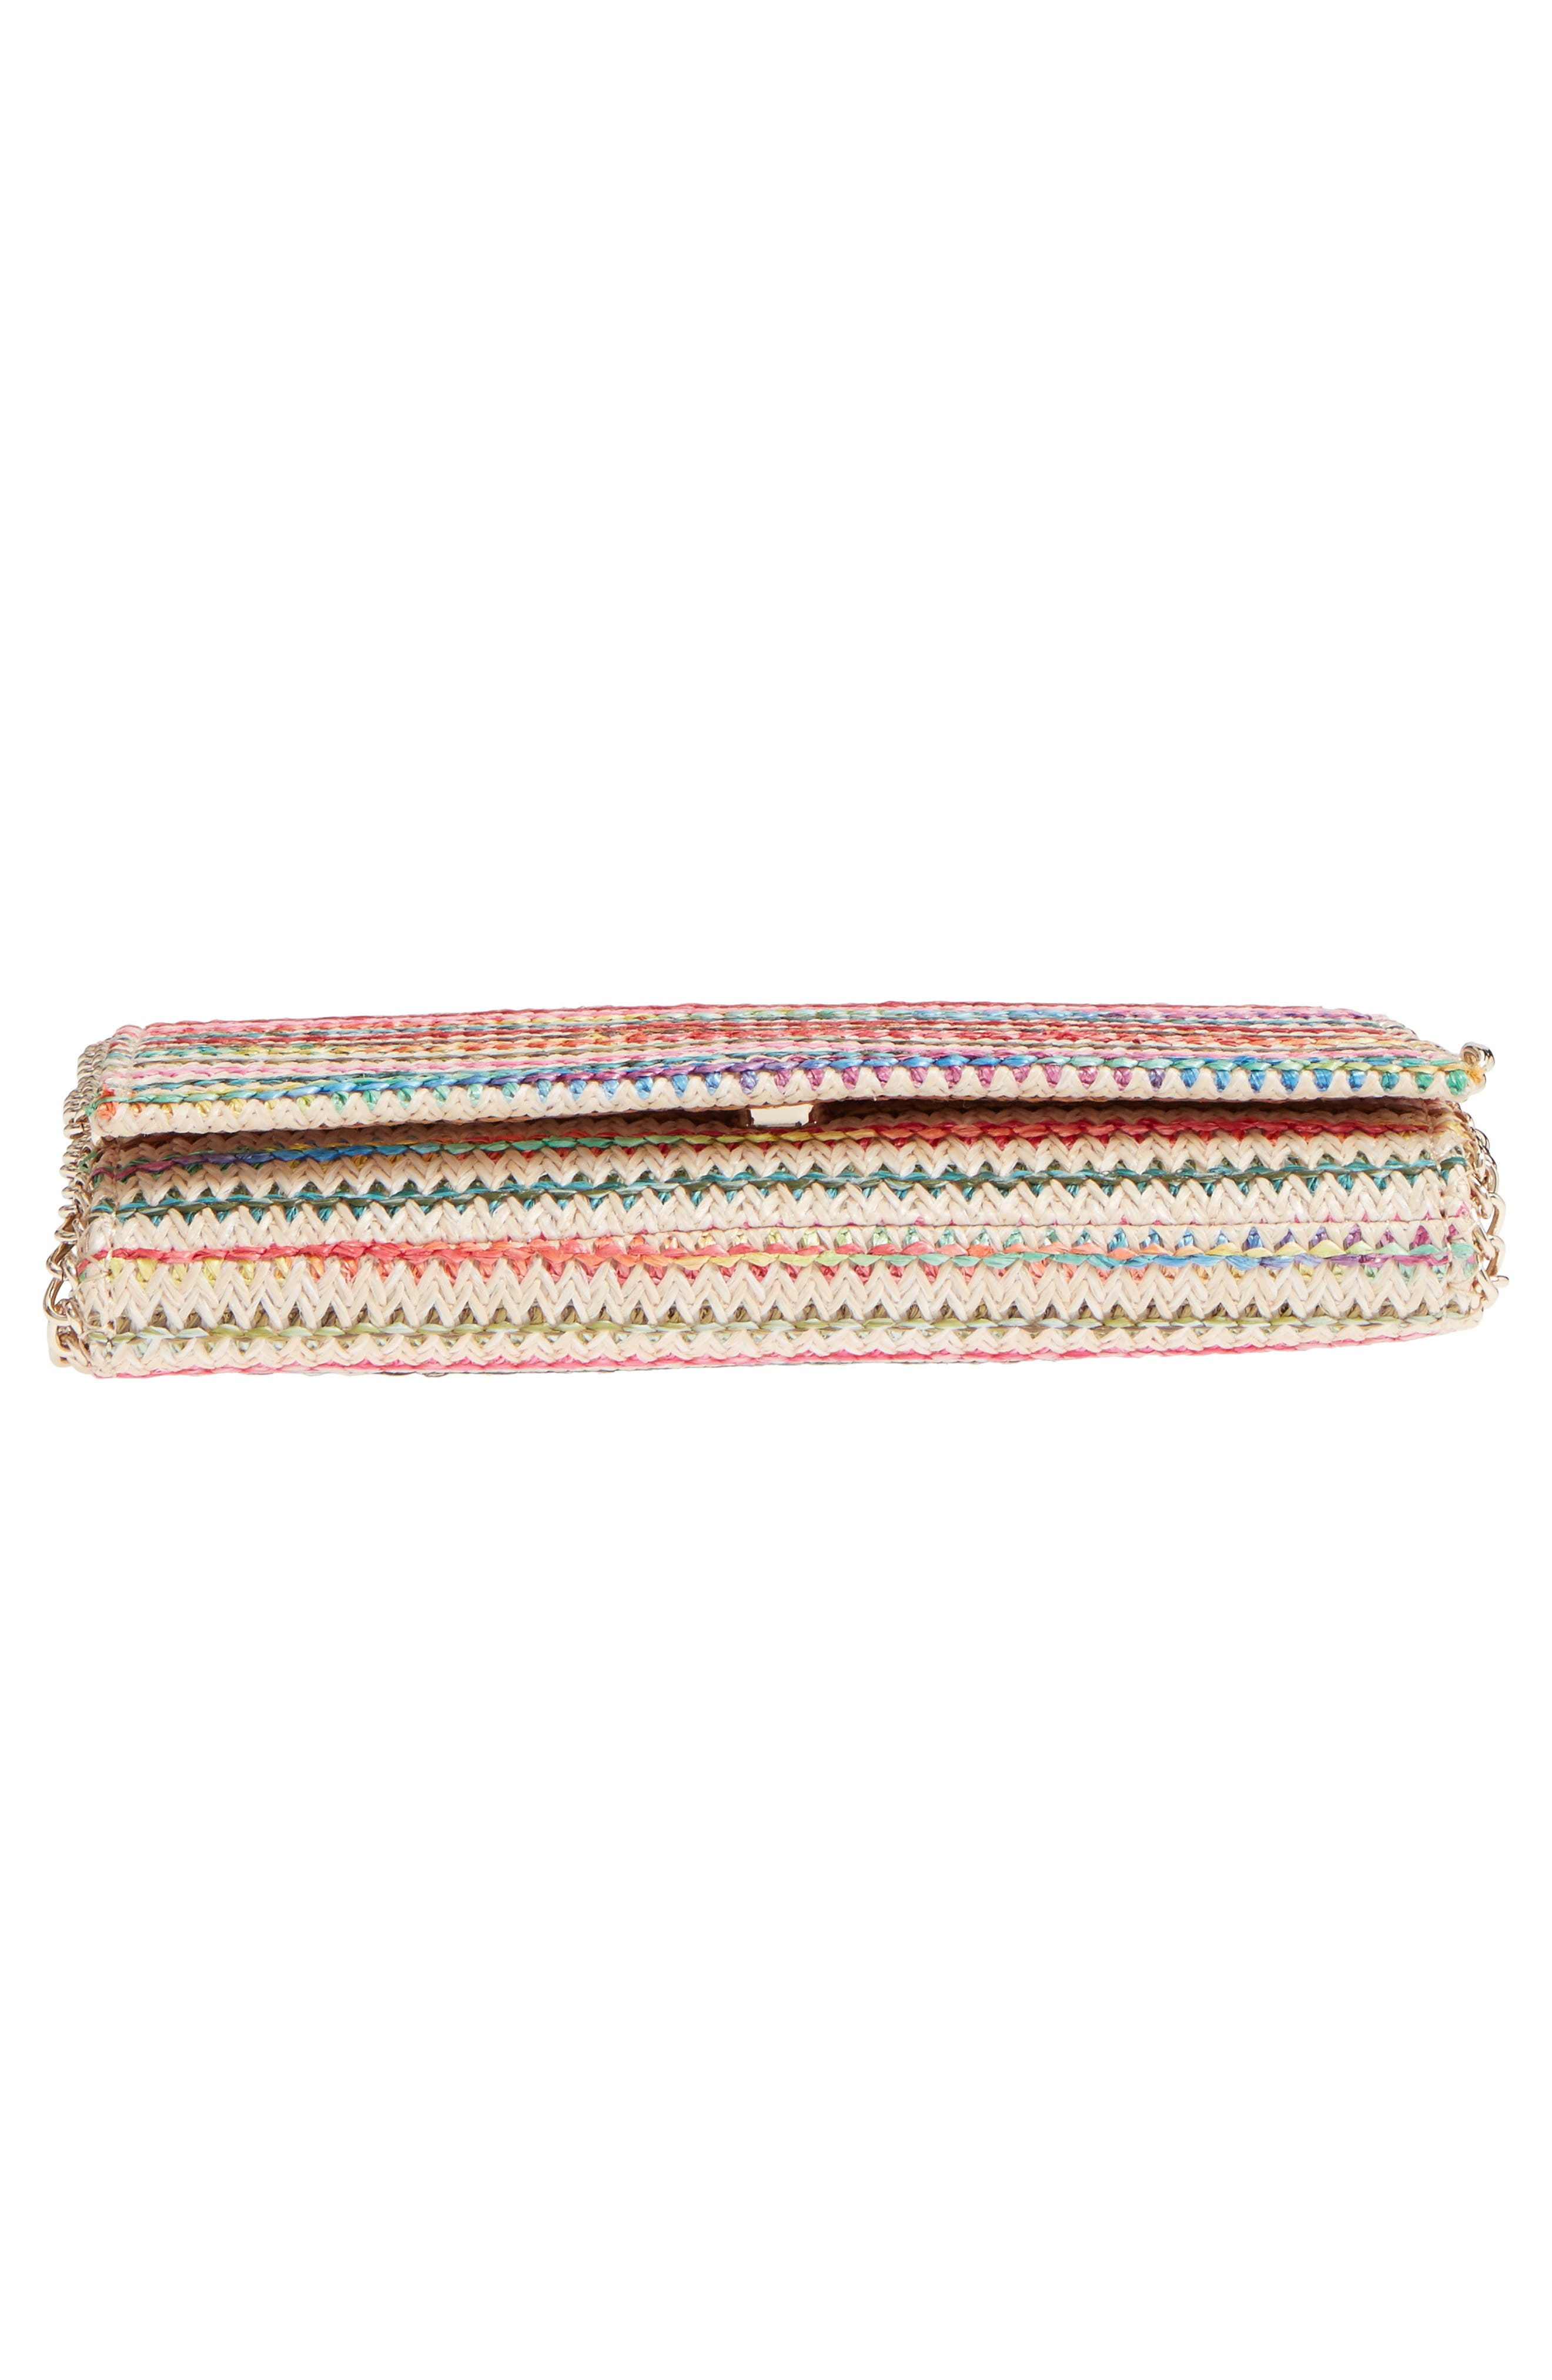 Multistripe Woven Clutch,                             Alternate thumbnail 6, color,                             Natural Multicolor Stripe